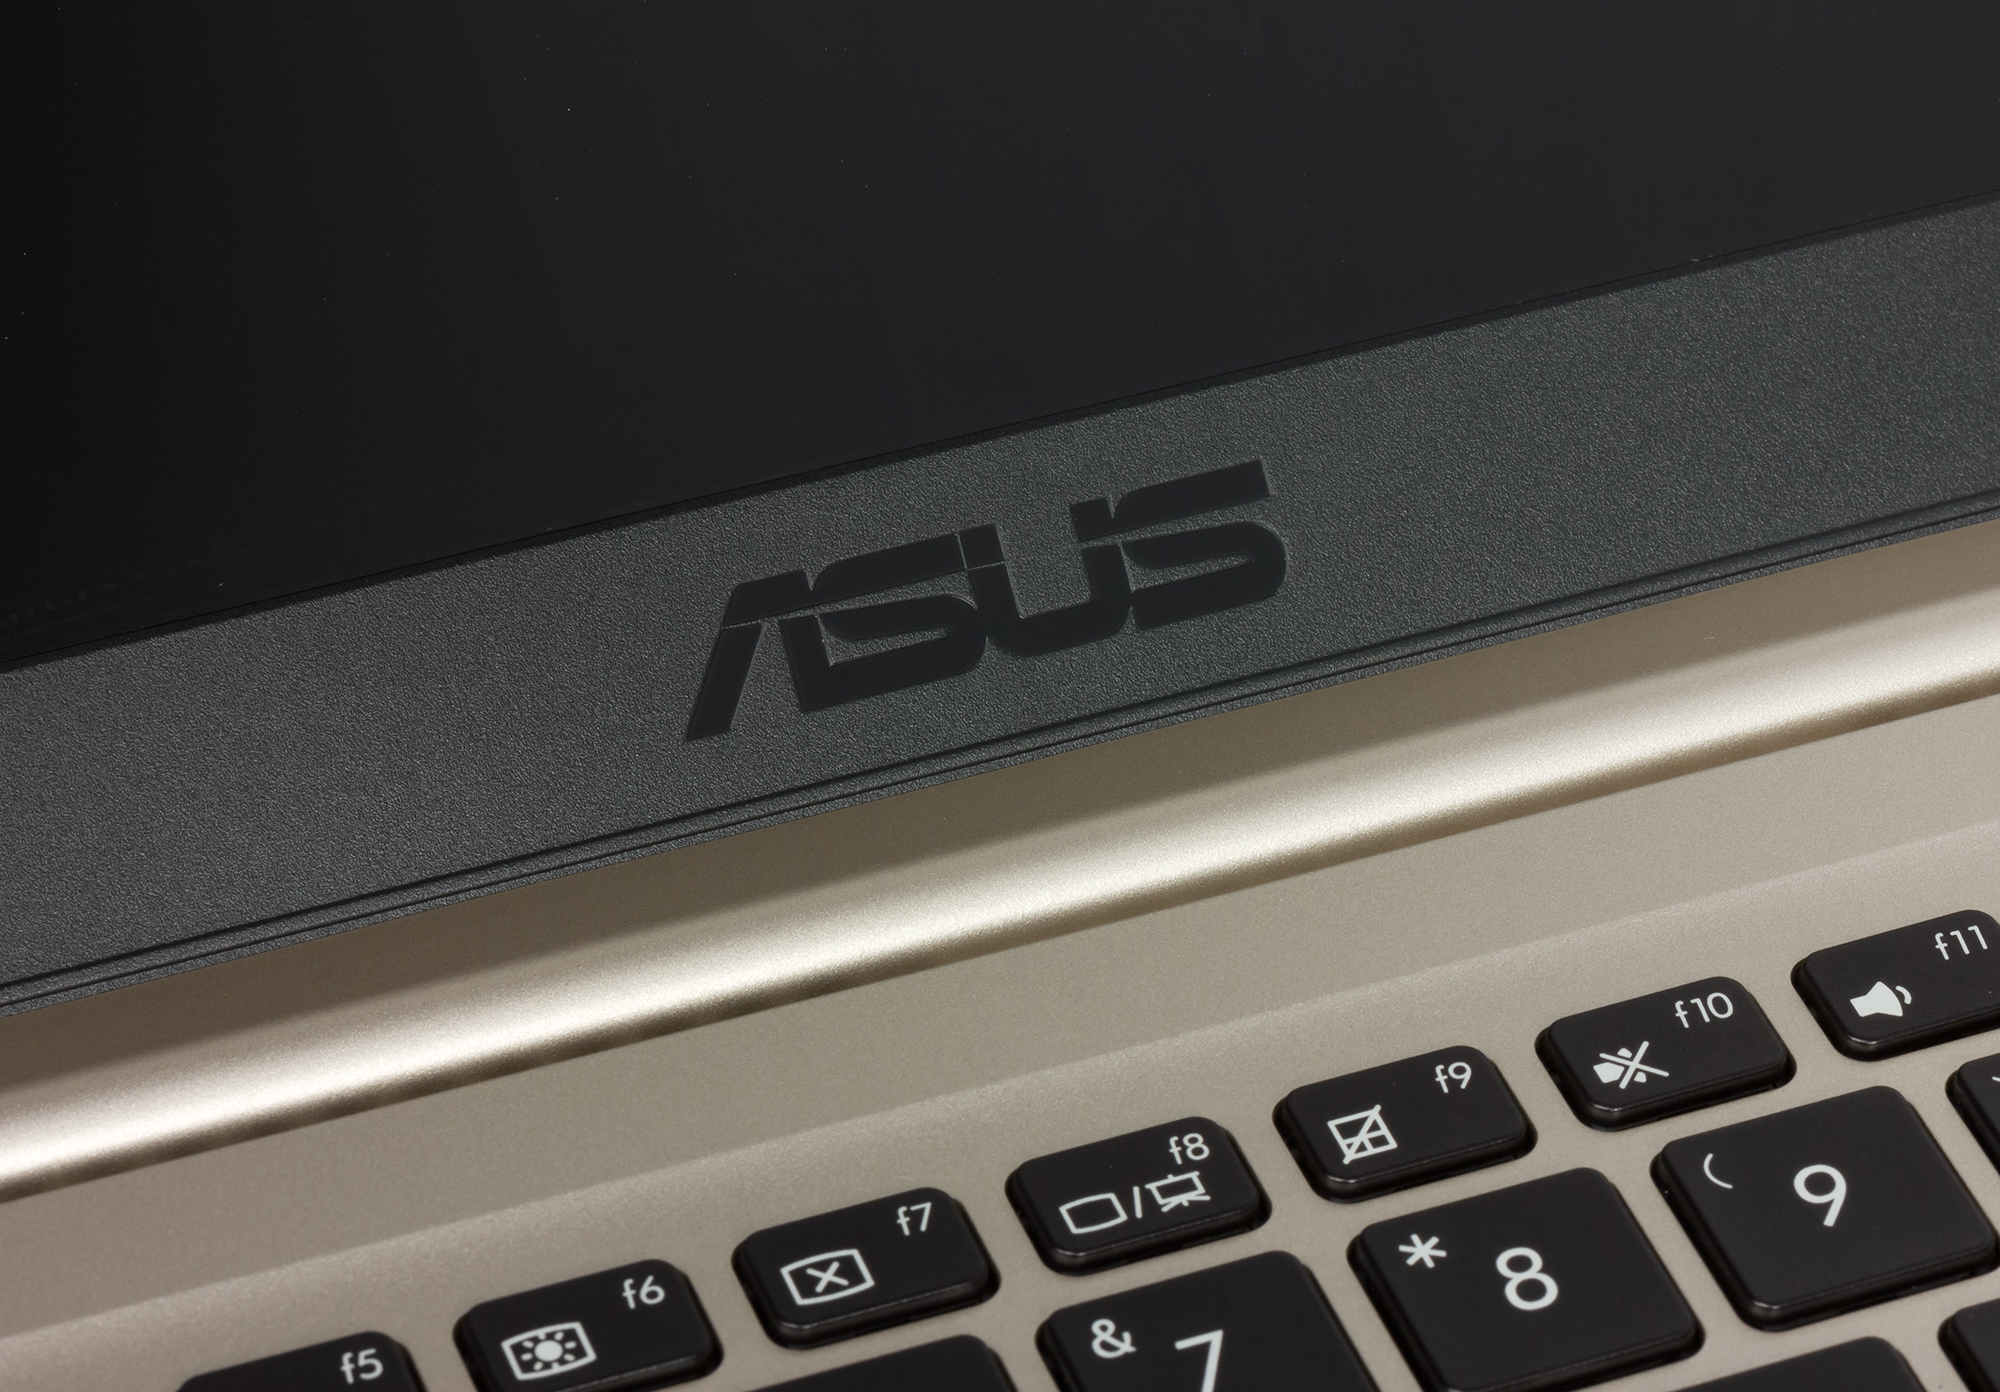 Asus DM CL Camera Drivers for Mac Download